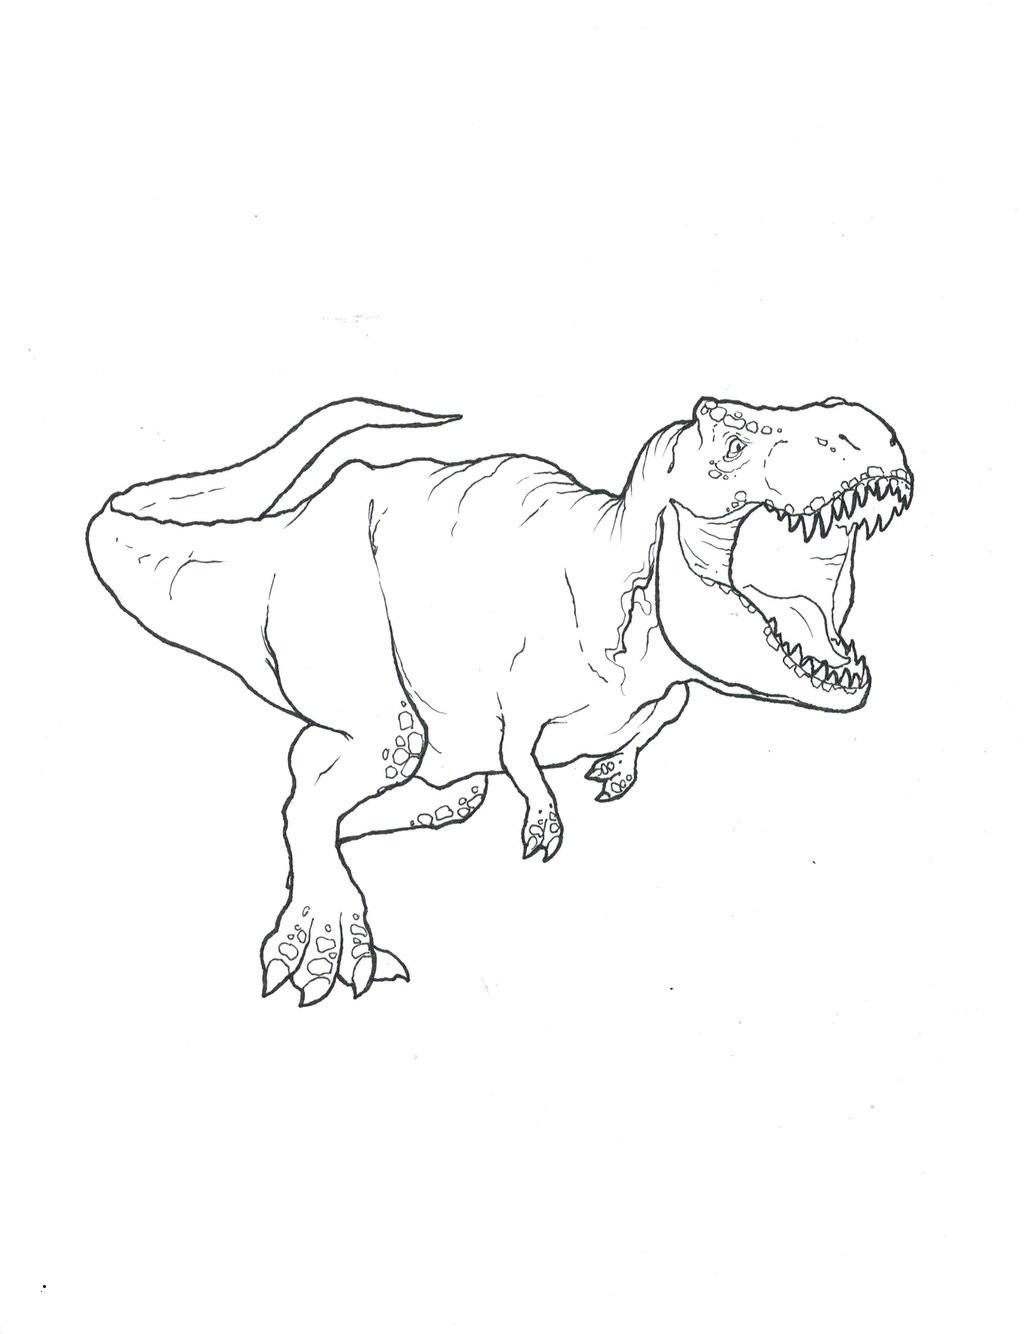 Dinosaurier Ausmalbilder Tyrannosaurus Rex Neu 44 Idee Ausmalbilder Tyrannosaurus Rex Treehouse Nyc Fotos